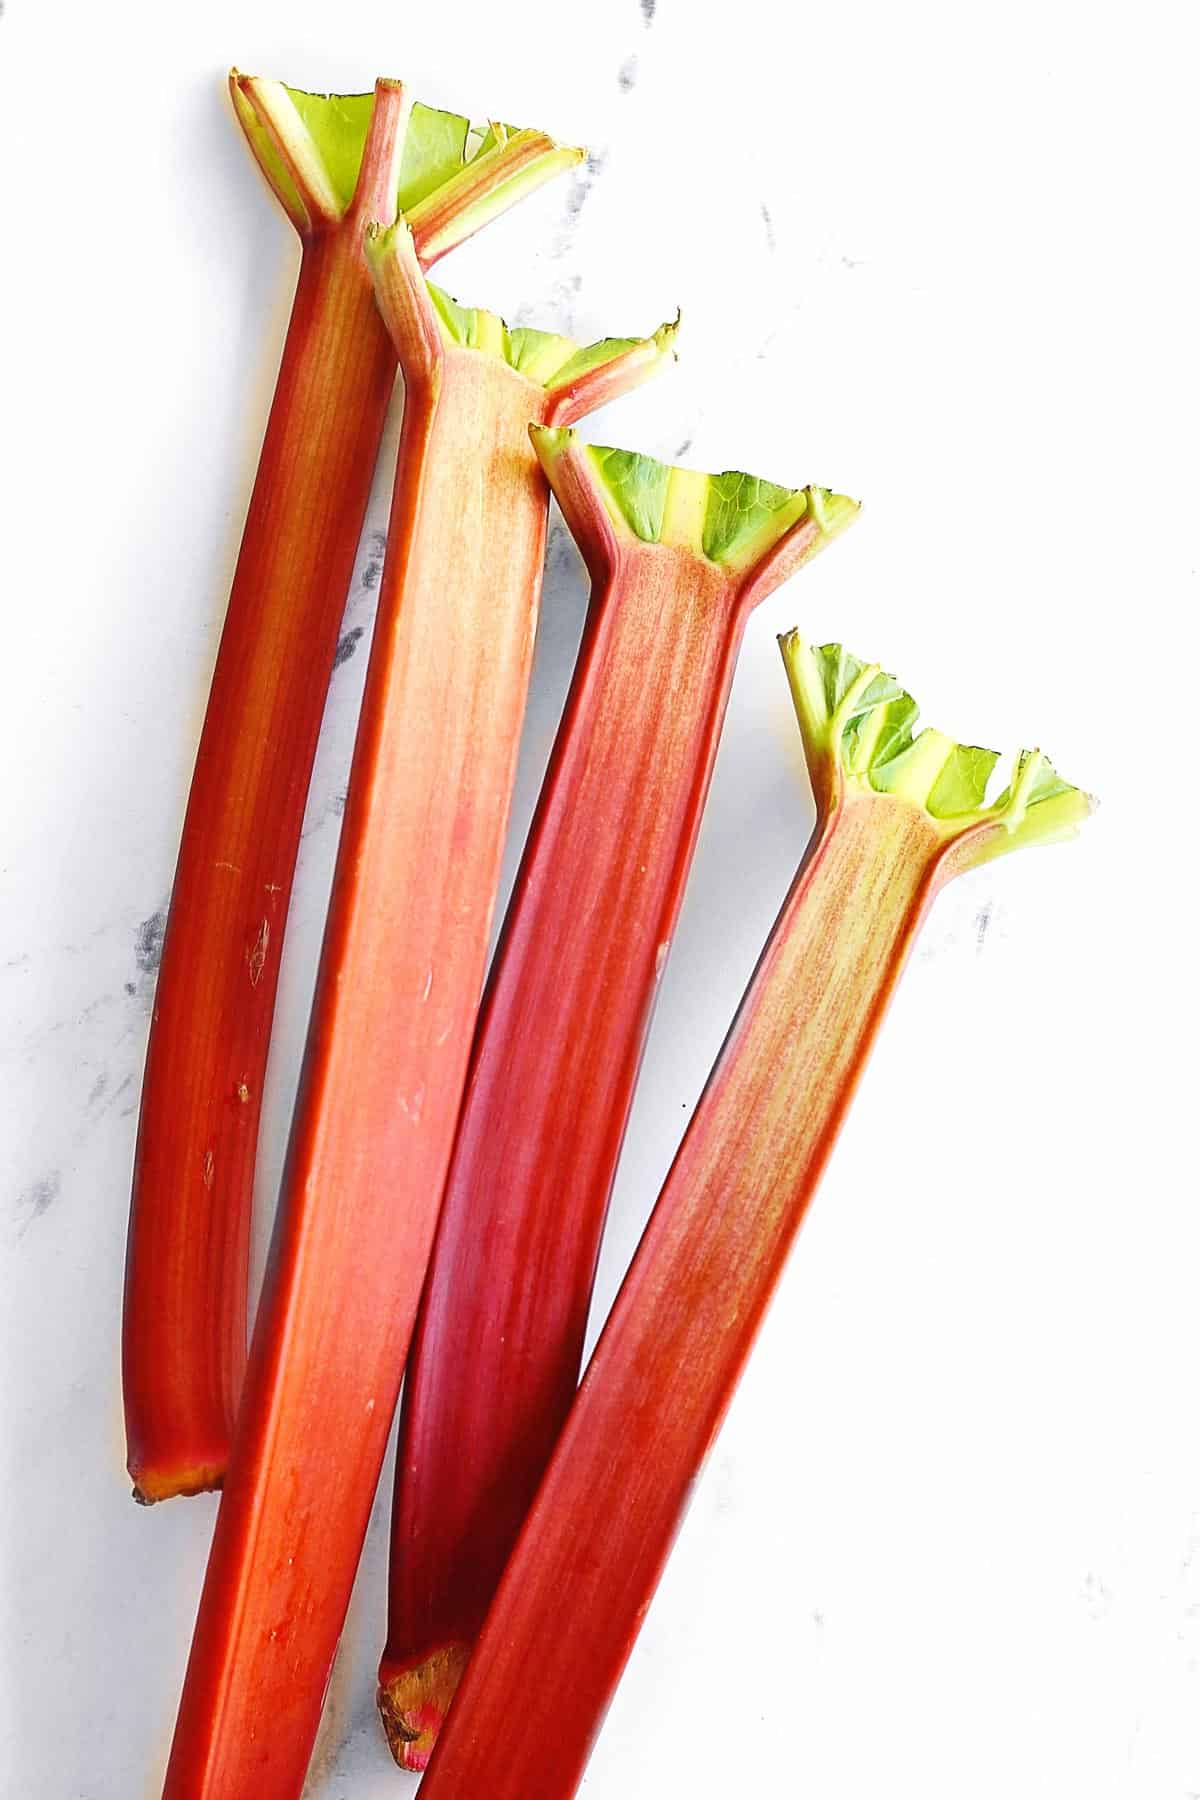 4 rhubarb stalks with leaves cut off